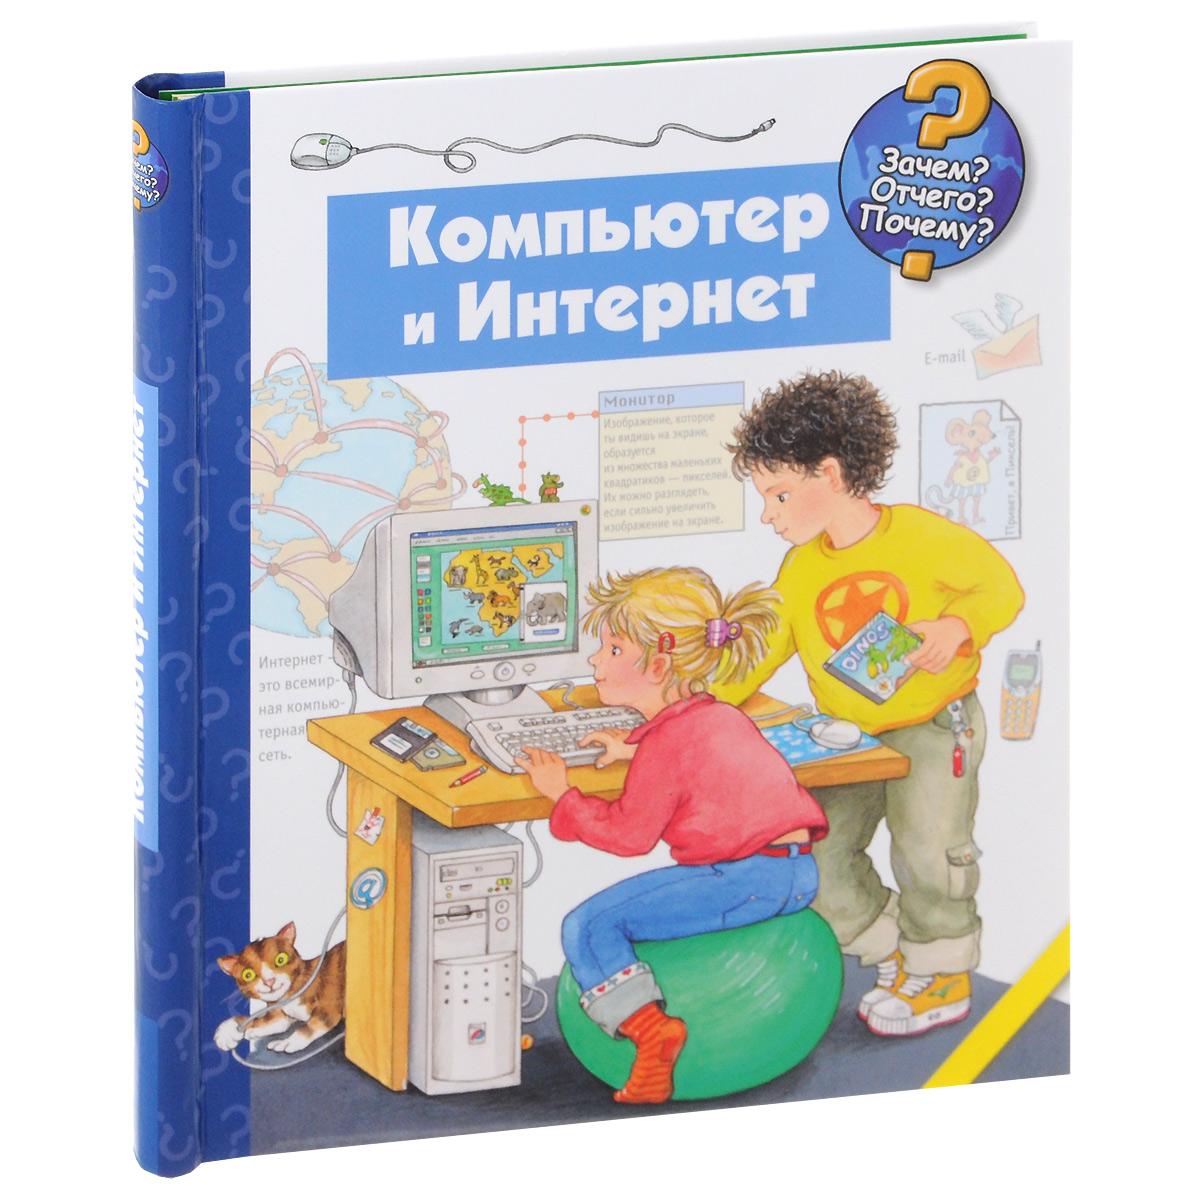 Андреас Вильхельм Компьютер и Интернет компьютер хаус майкоп интернет магазин